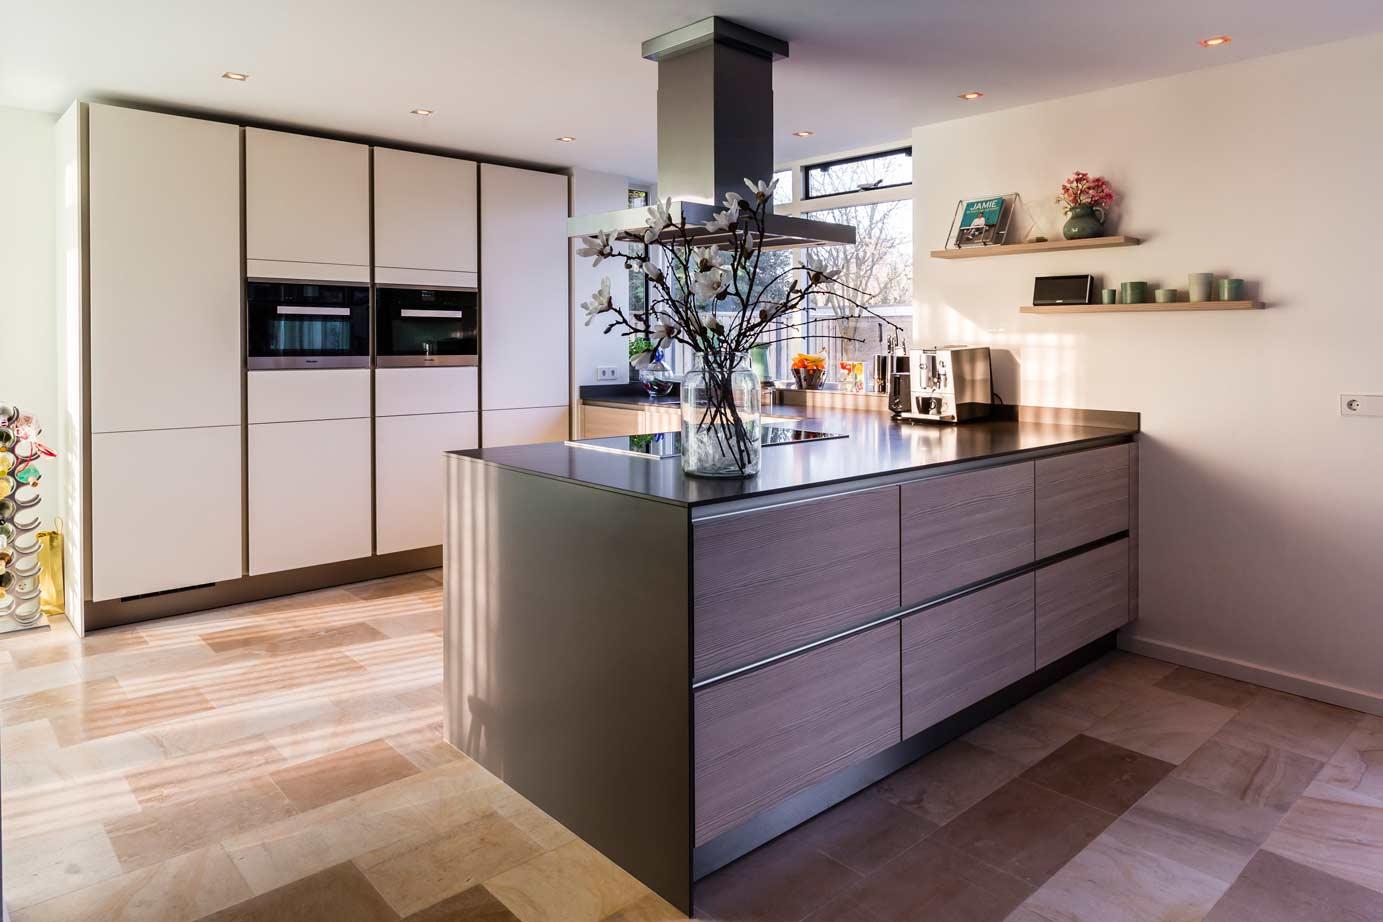 Witte keuken welke kleur muren keuken verven welke kleur fresh